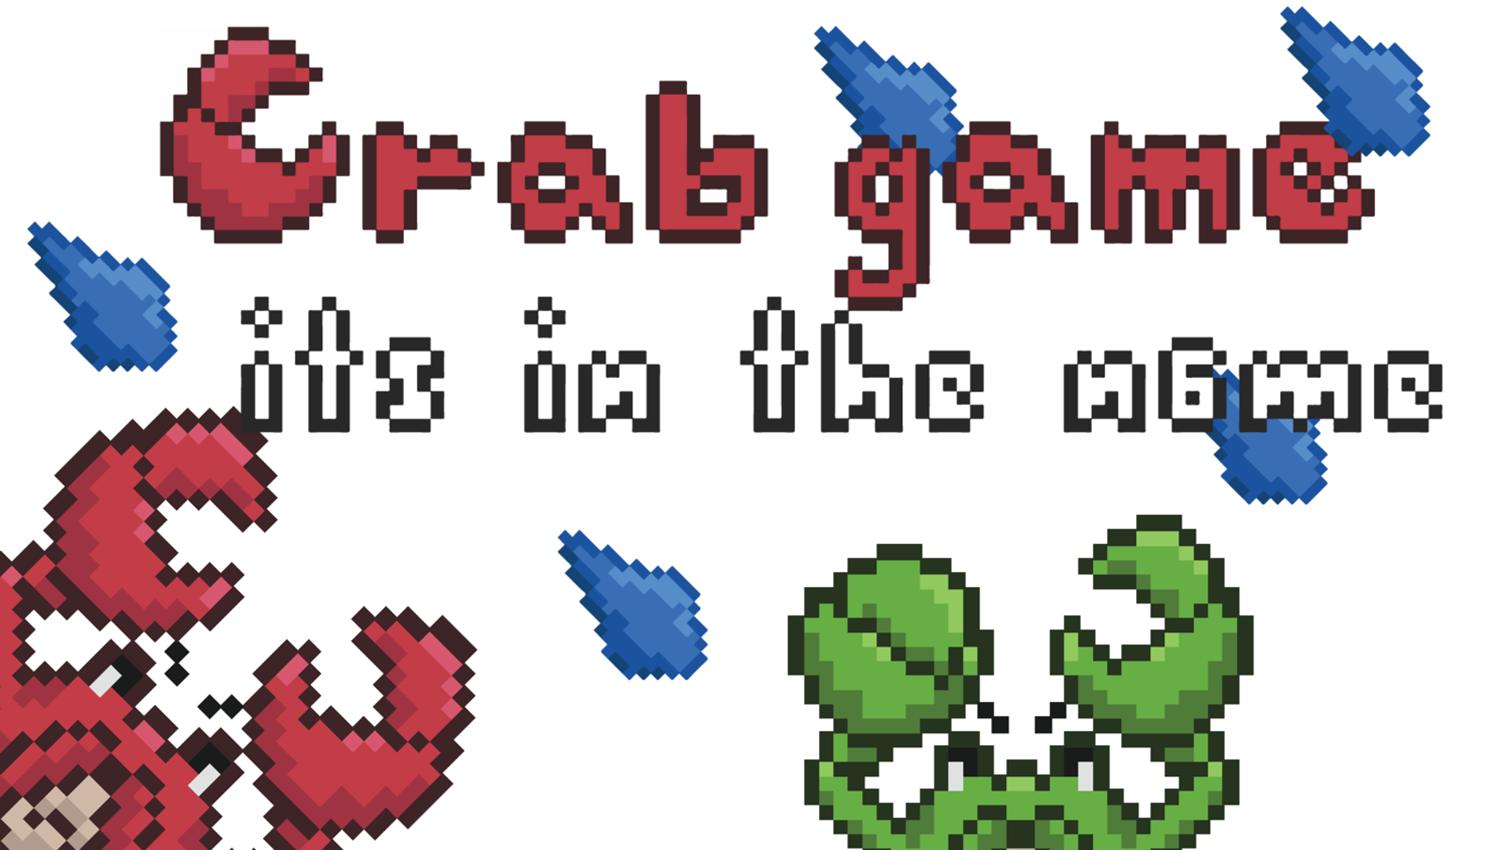 CrabGameMainThumbNail.png